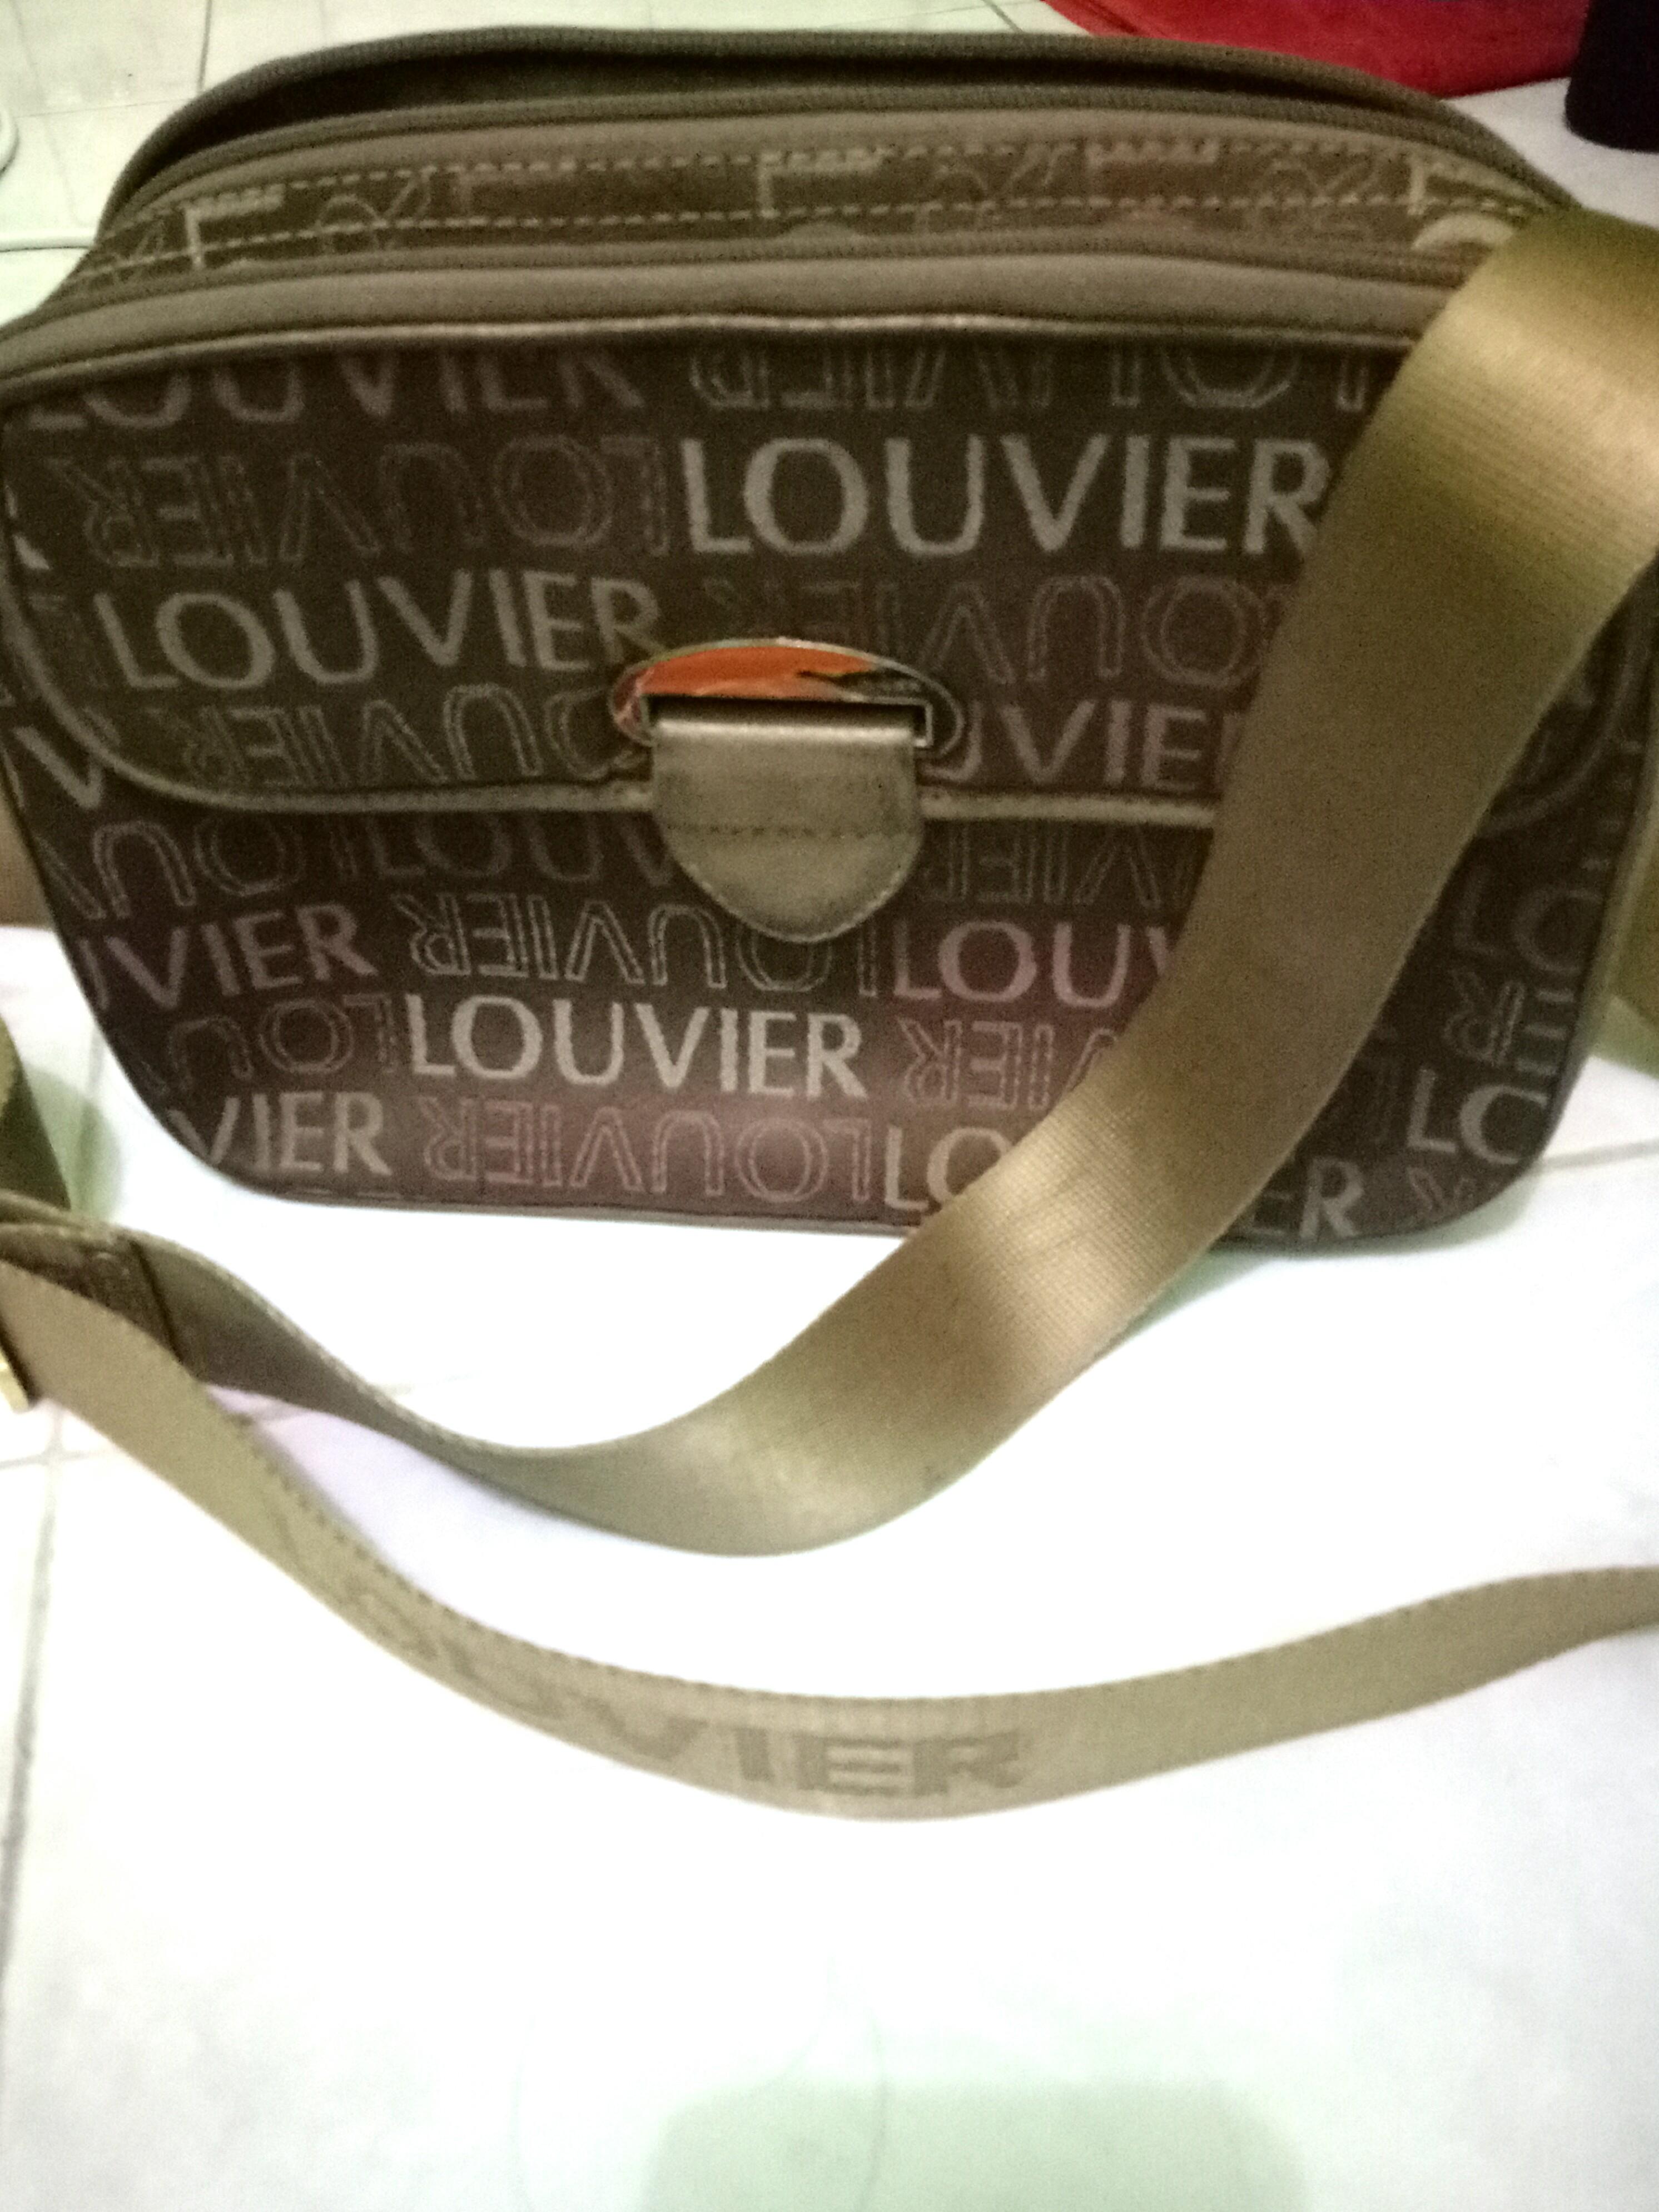 Louvier kw super 1aa79861e2